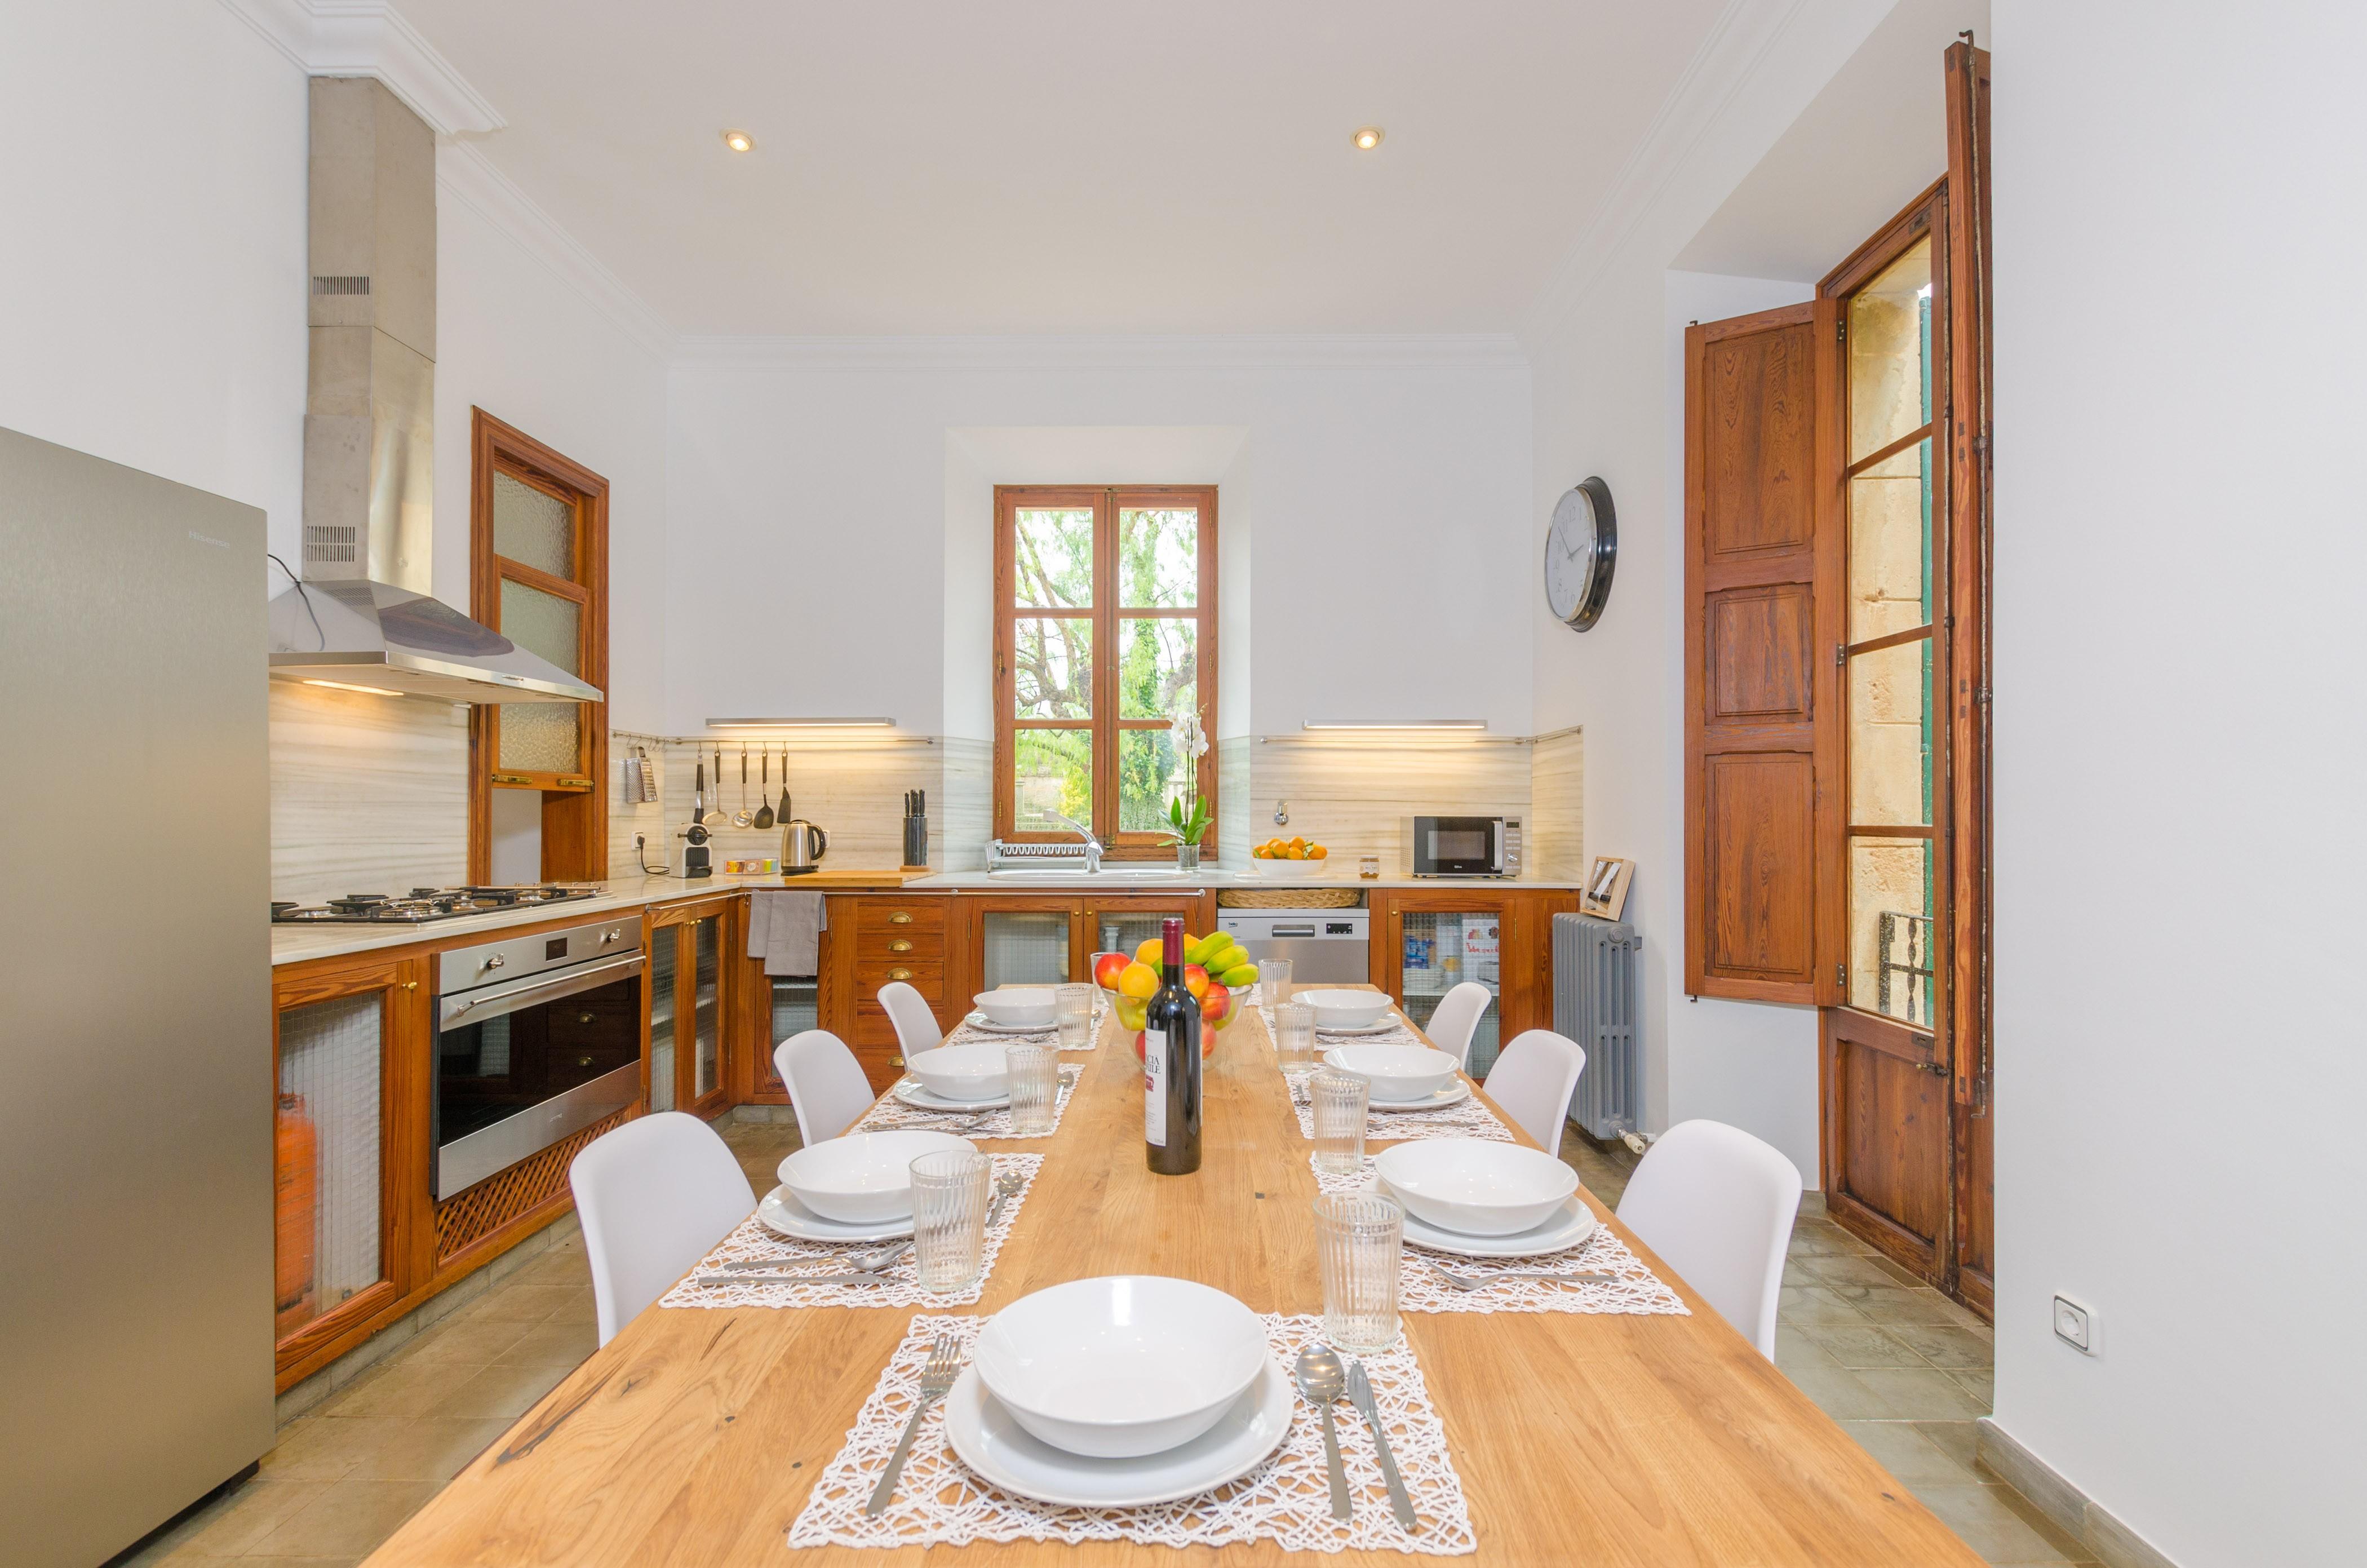 Maison de vacances CAS CONVIDATS (2435013), Alaro, Majorque, Iles Baléares, Espagne, image 28